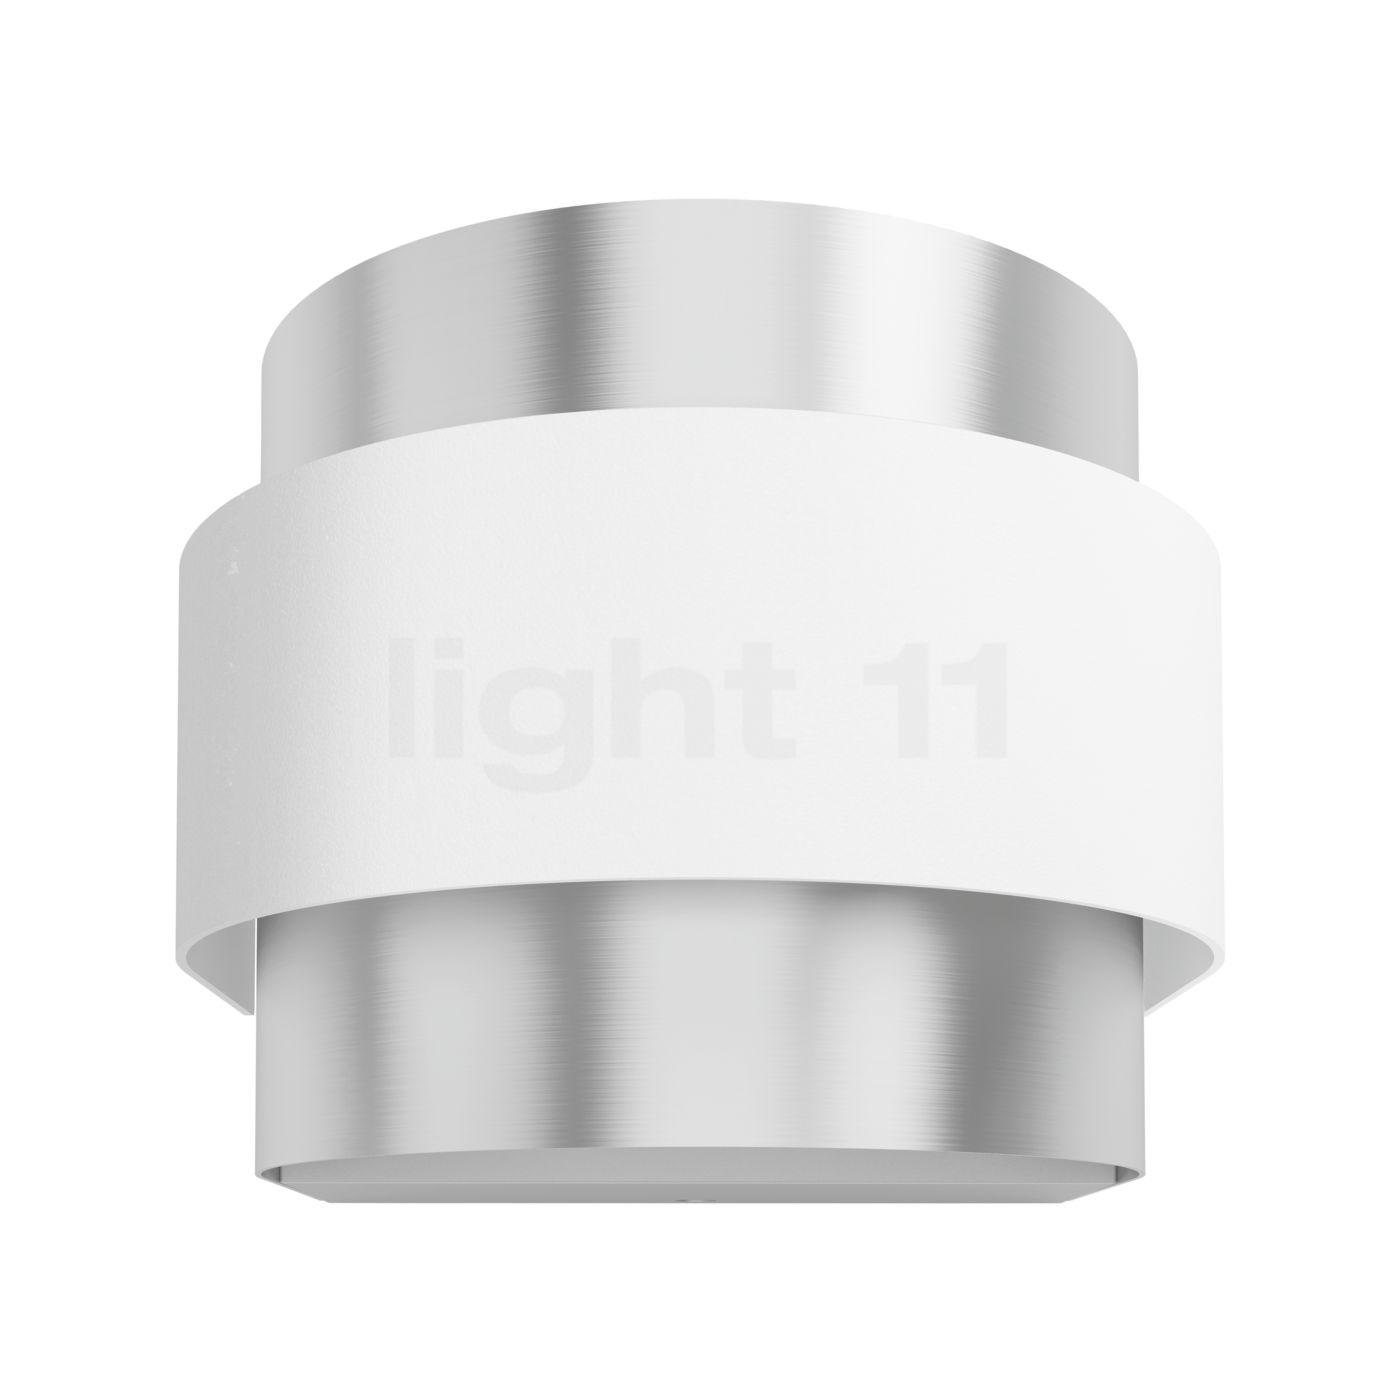 Philips Led Wall Lamps : Philips Myliving Drava Wall light LED buy at light11.eu